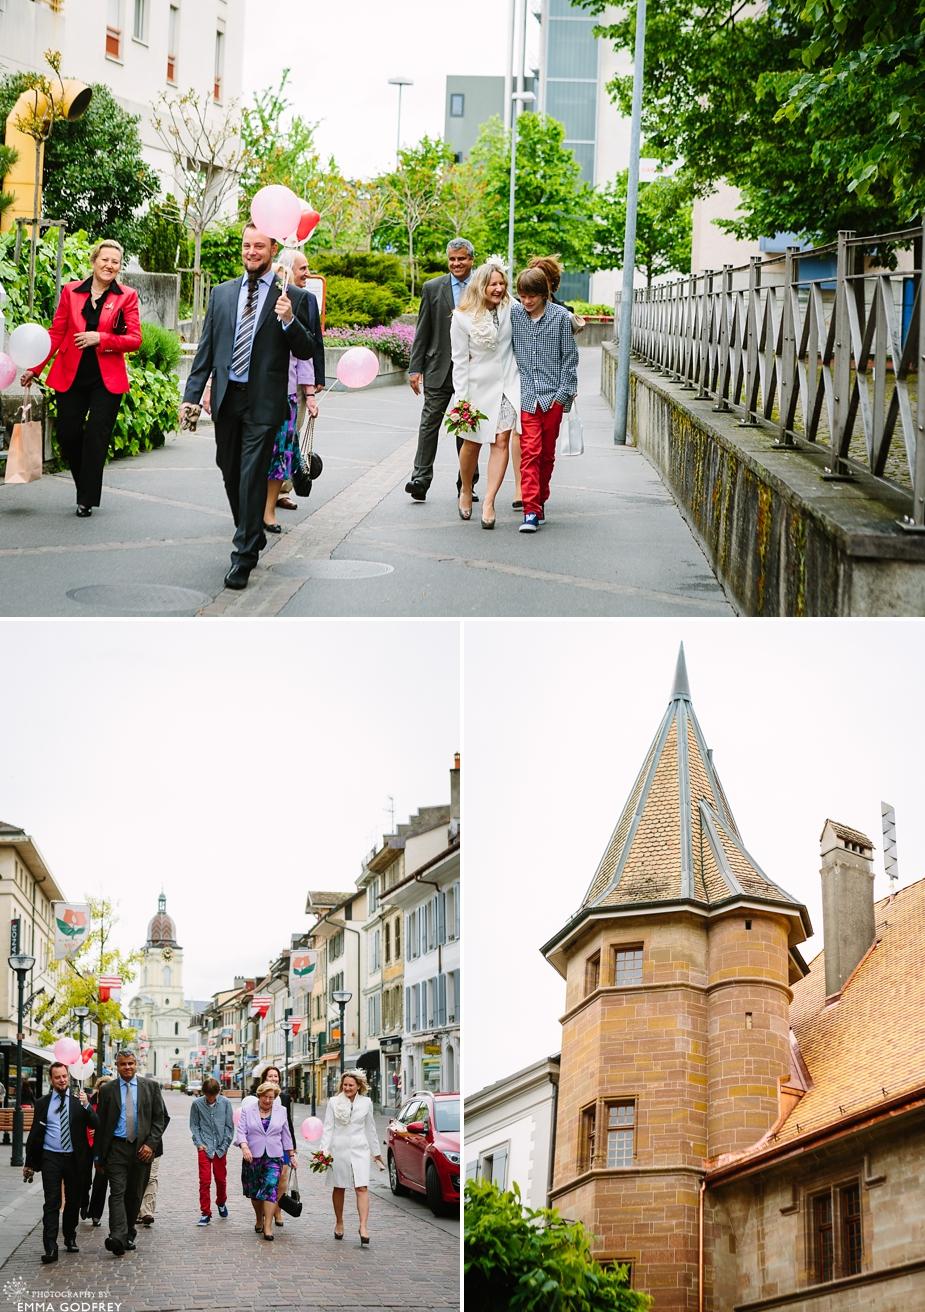 Morges-Civil-Wedding-Photographer-05.jpg